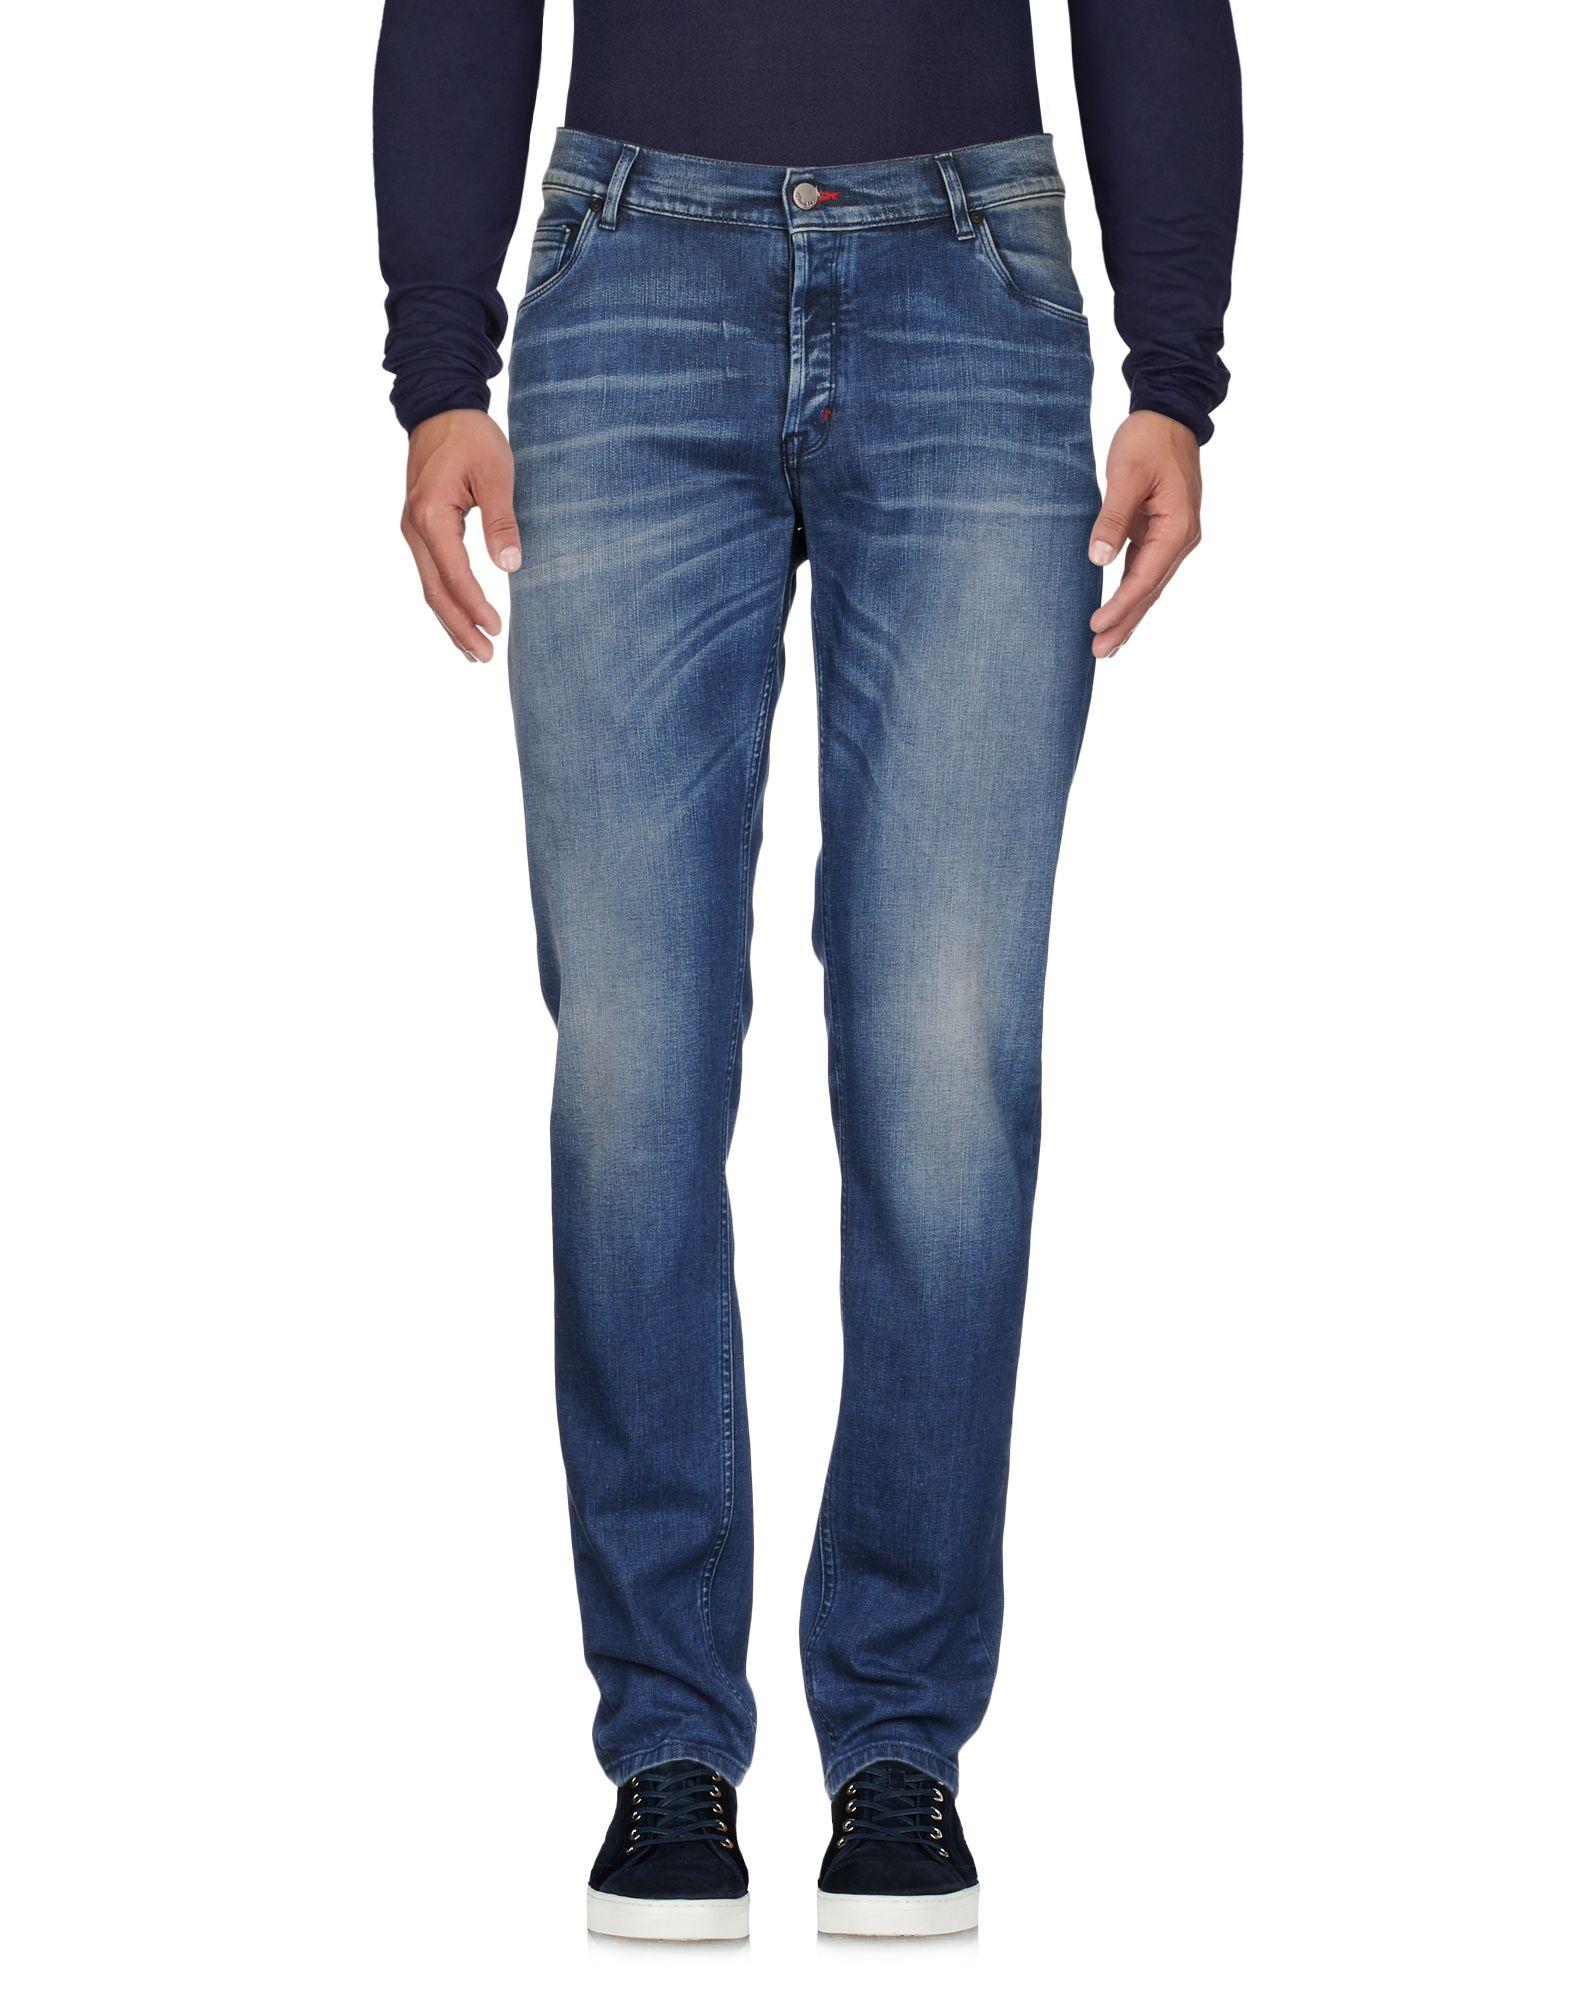 Pantaloni Jeans Jeans Pantaloni Daniele Alessandrini Homme Uomo - 42681840AV 514961